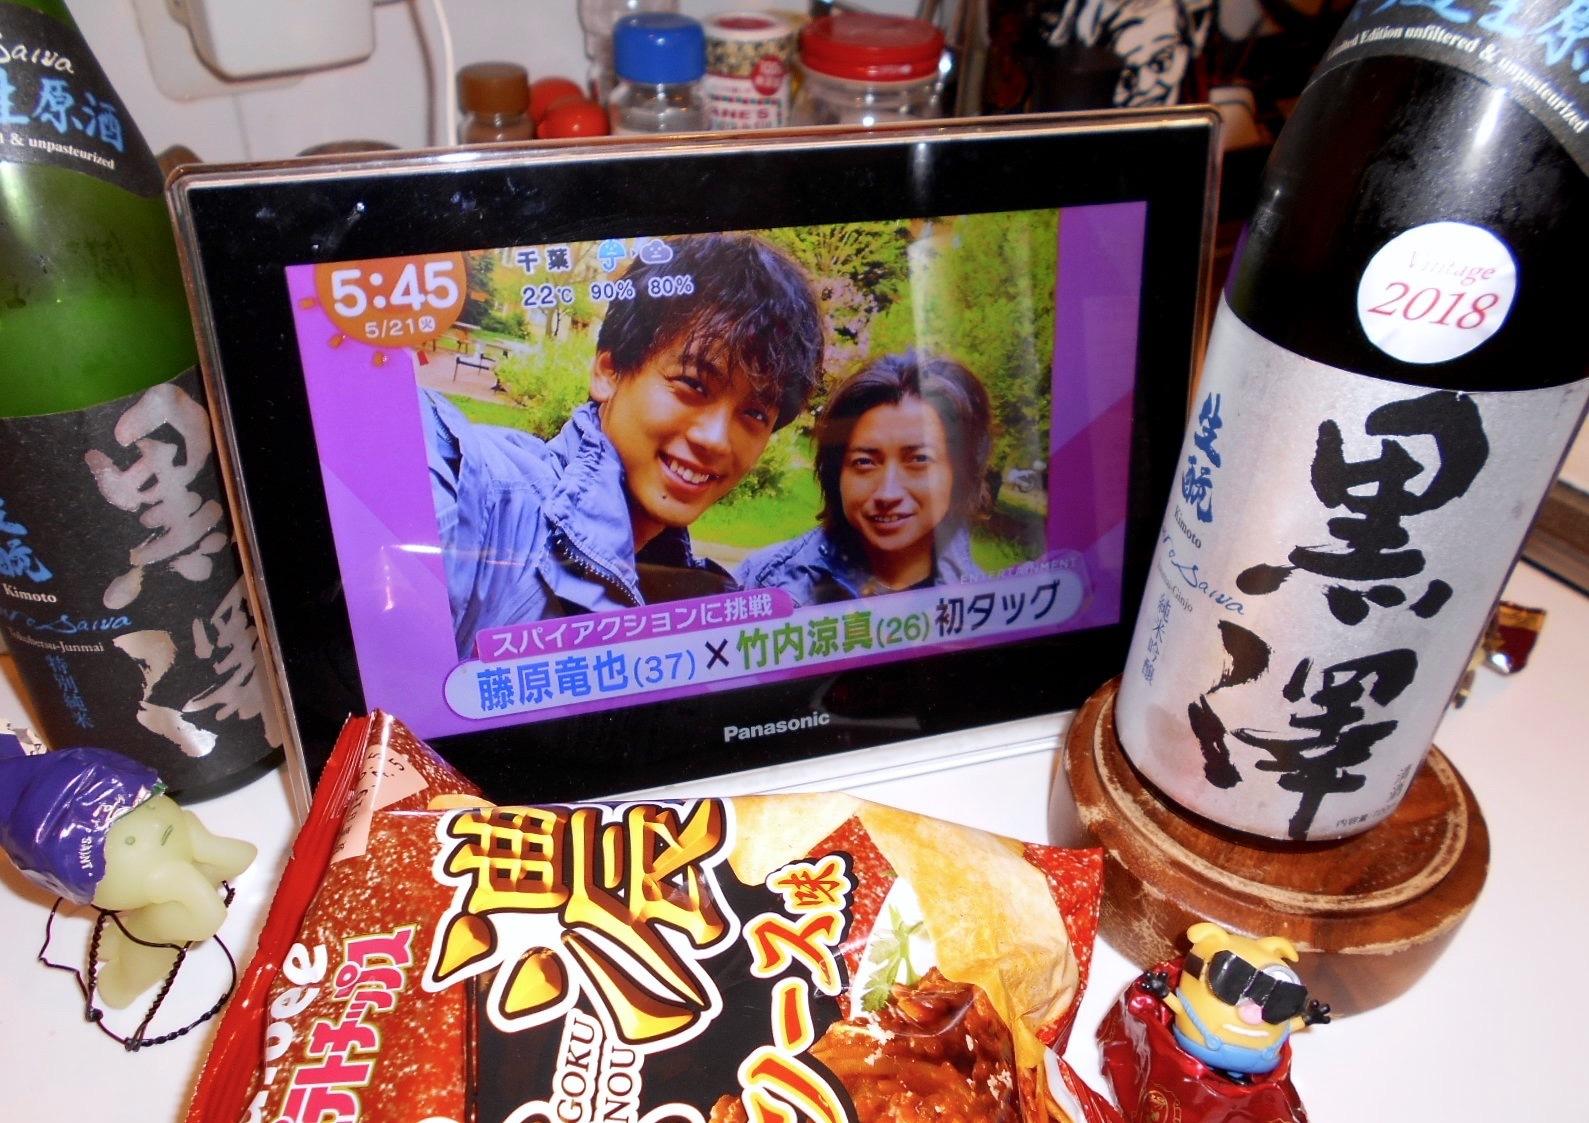 kurosawa2018jungin1.jpg